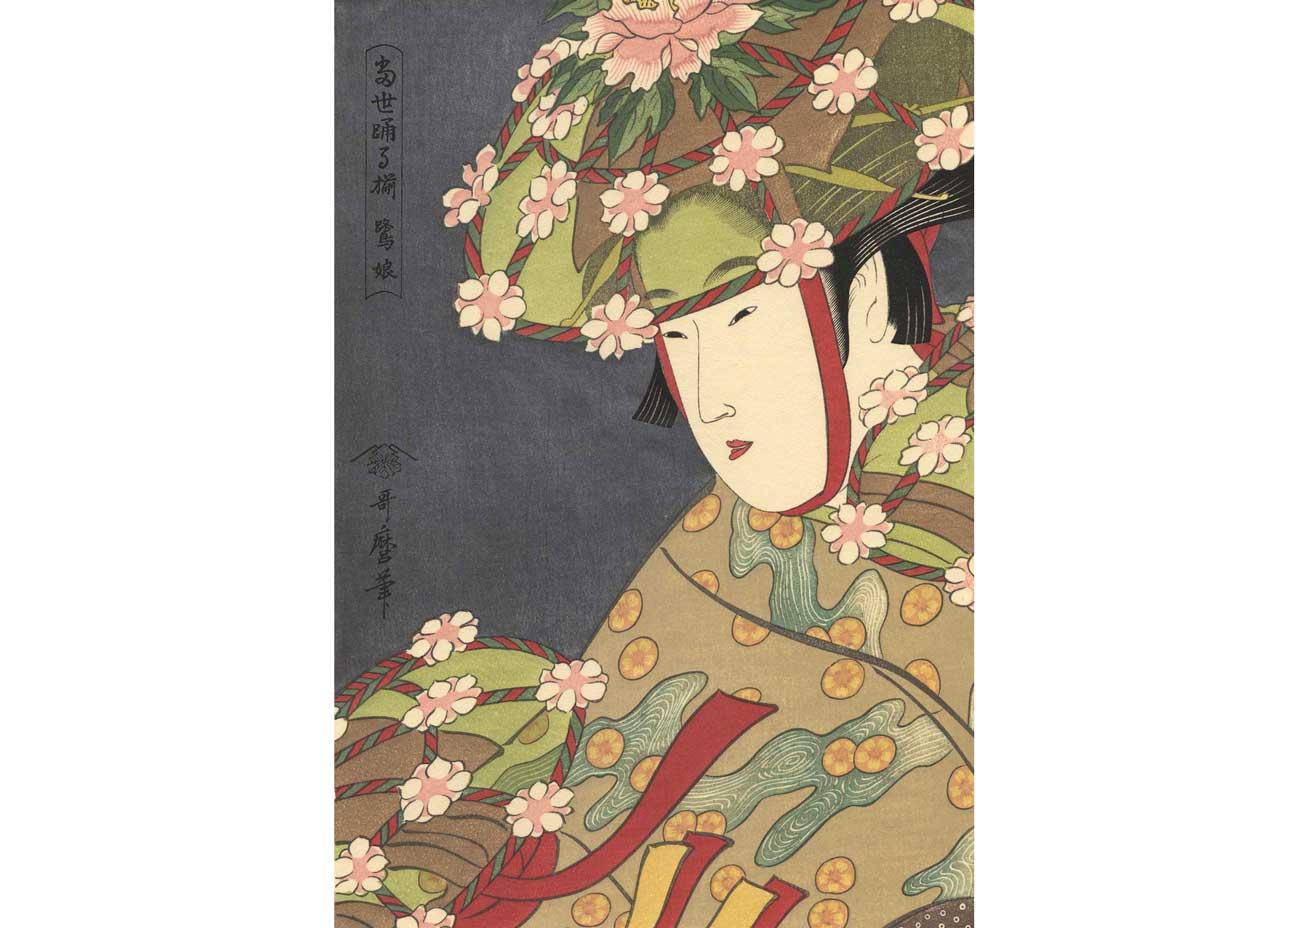 Heron Maiden, Woodblock Print by Kitagawa Utamaro